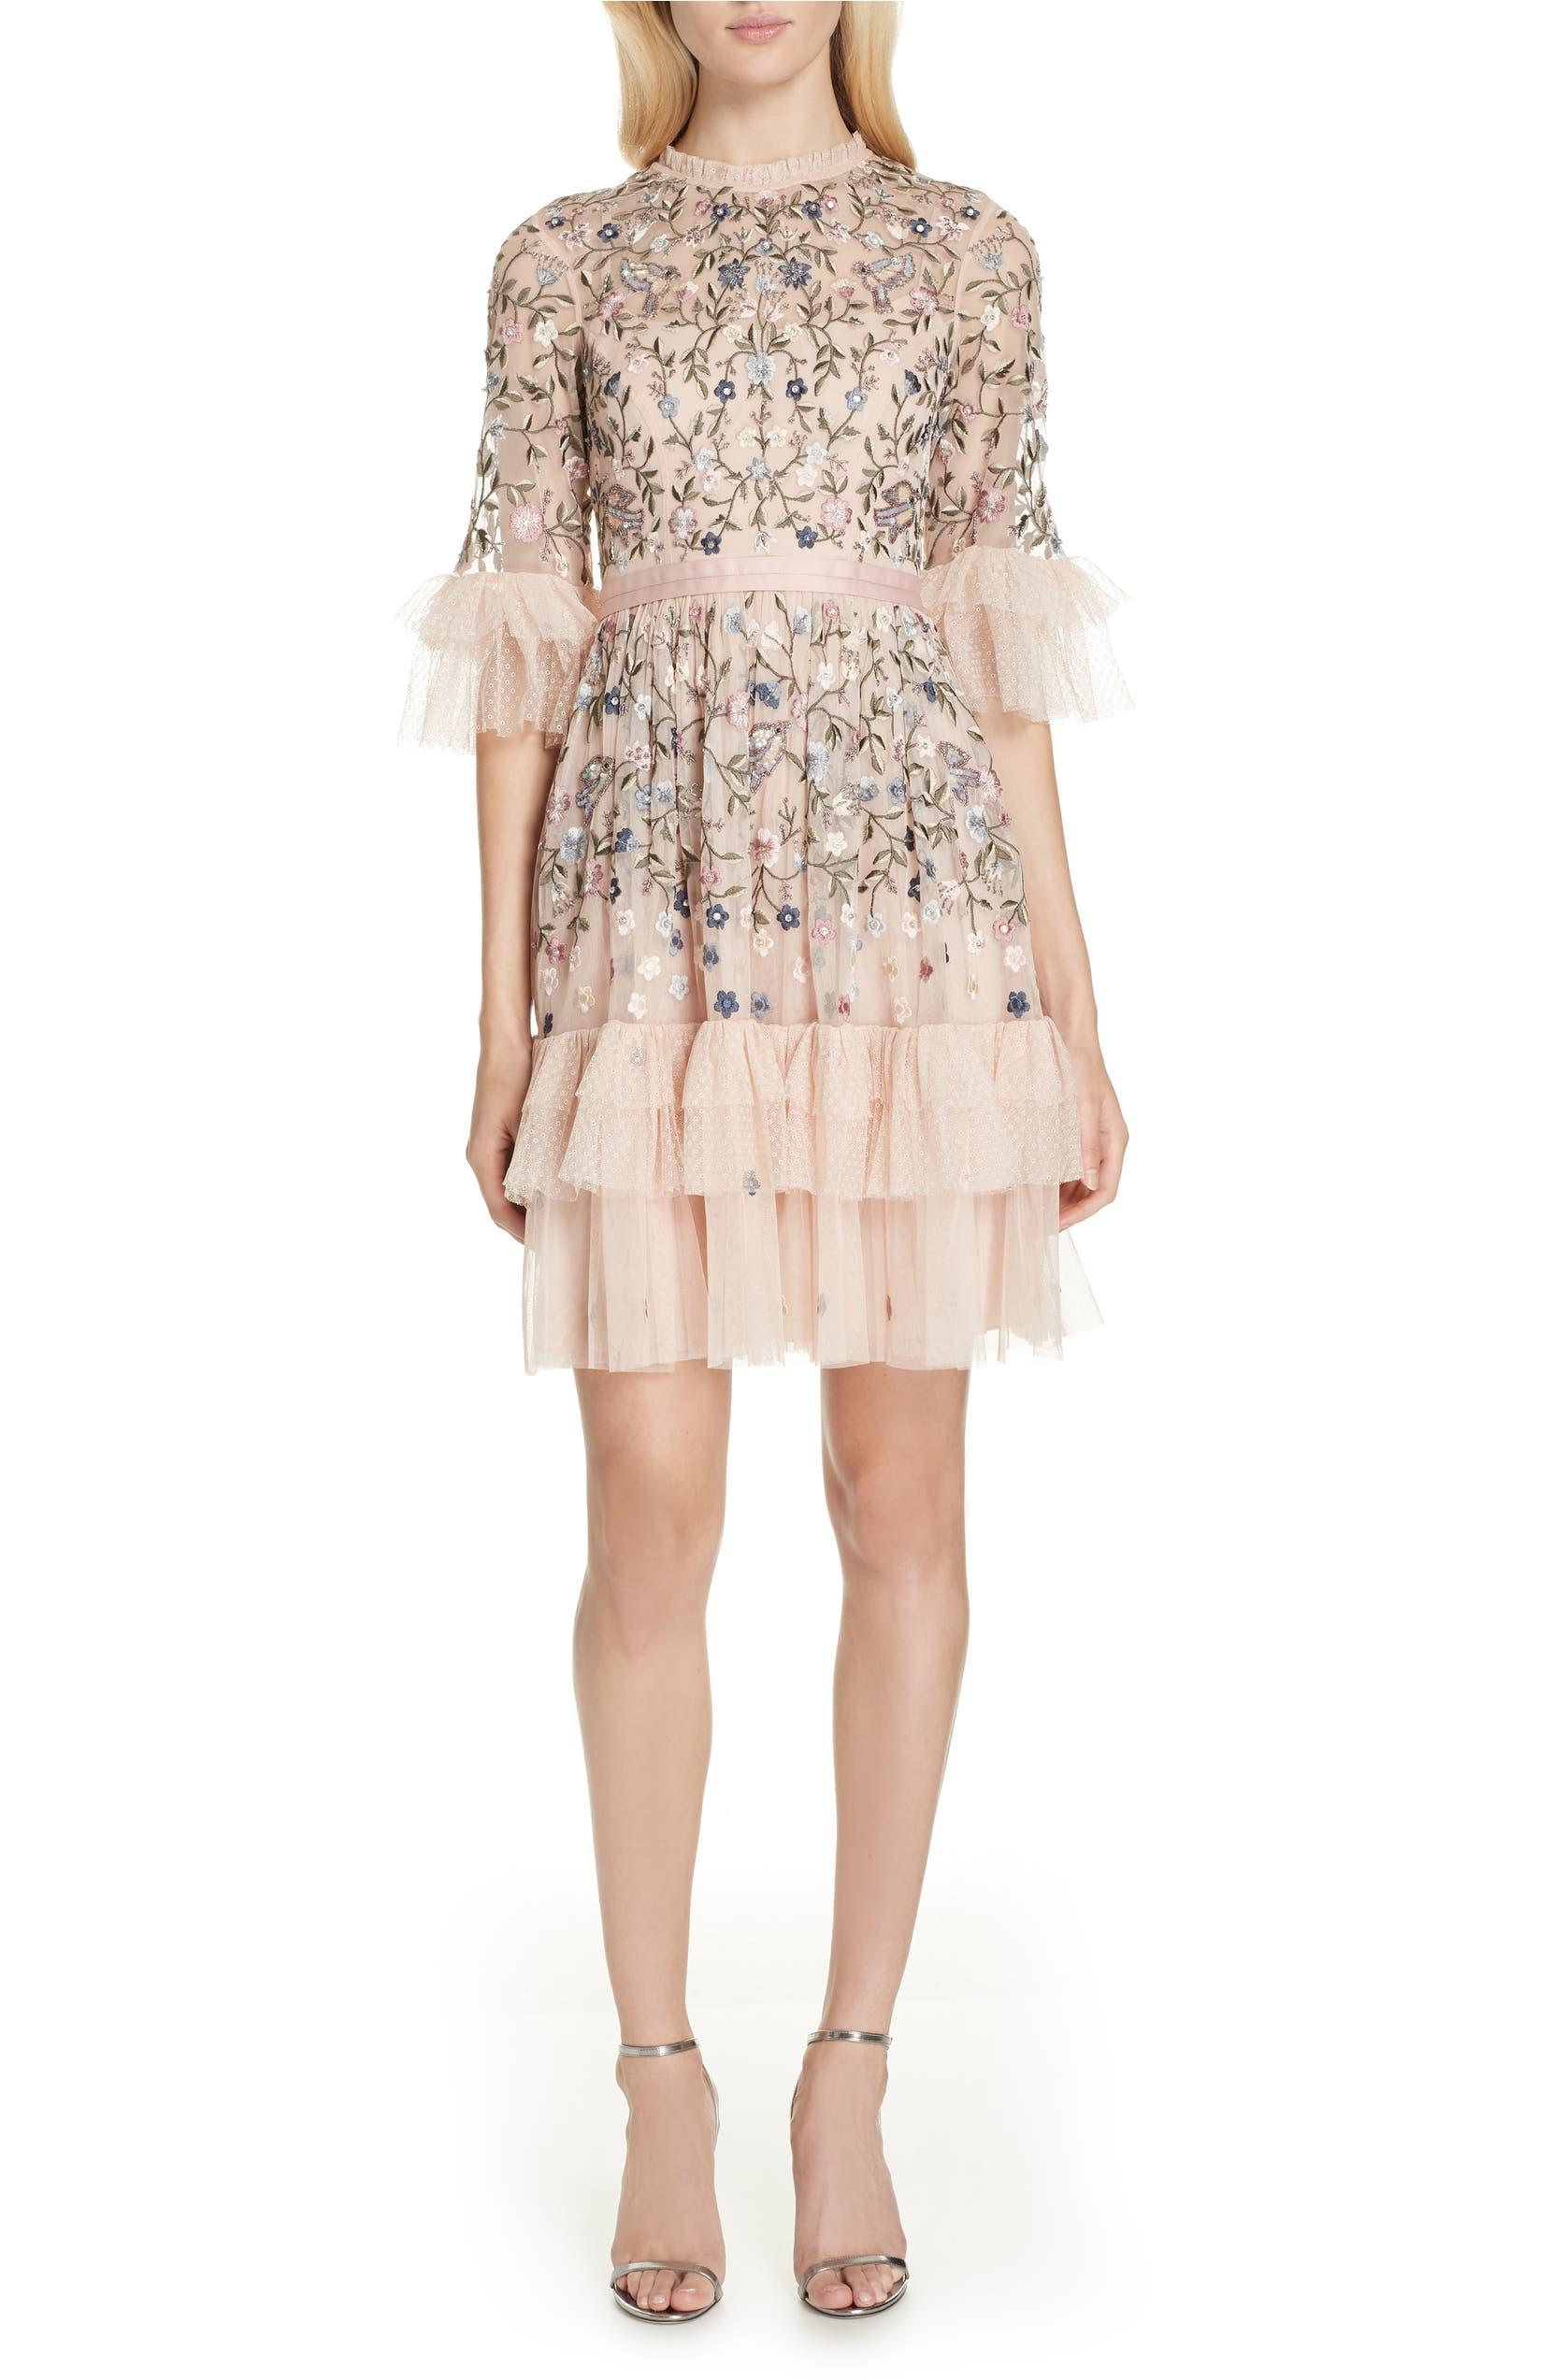 6b7911f5fcde Needle & Thread Dusk Floral A-Line Dress | Nordstrom